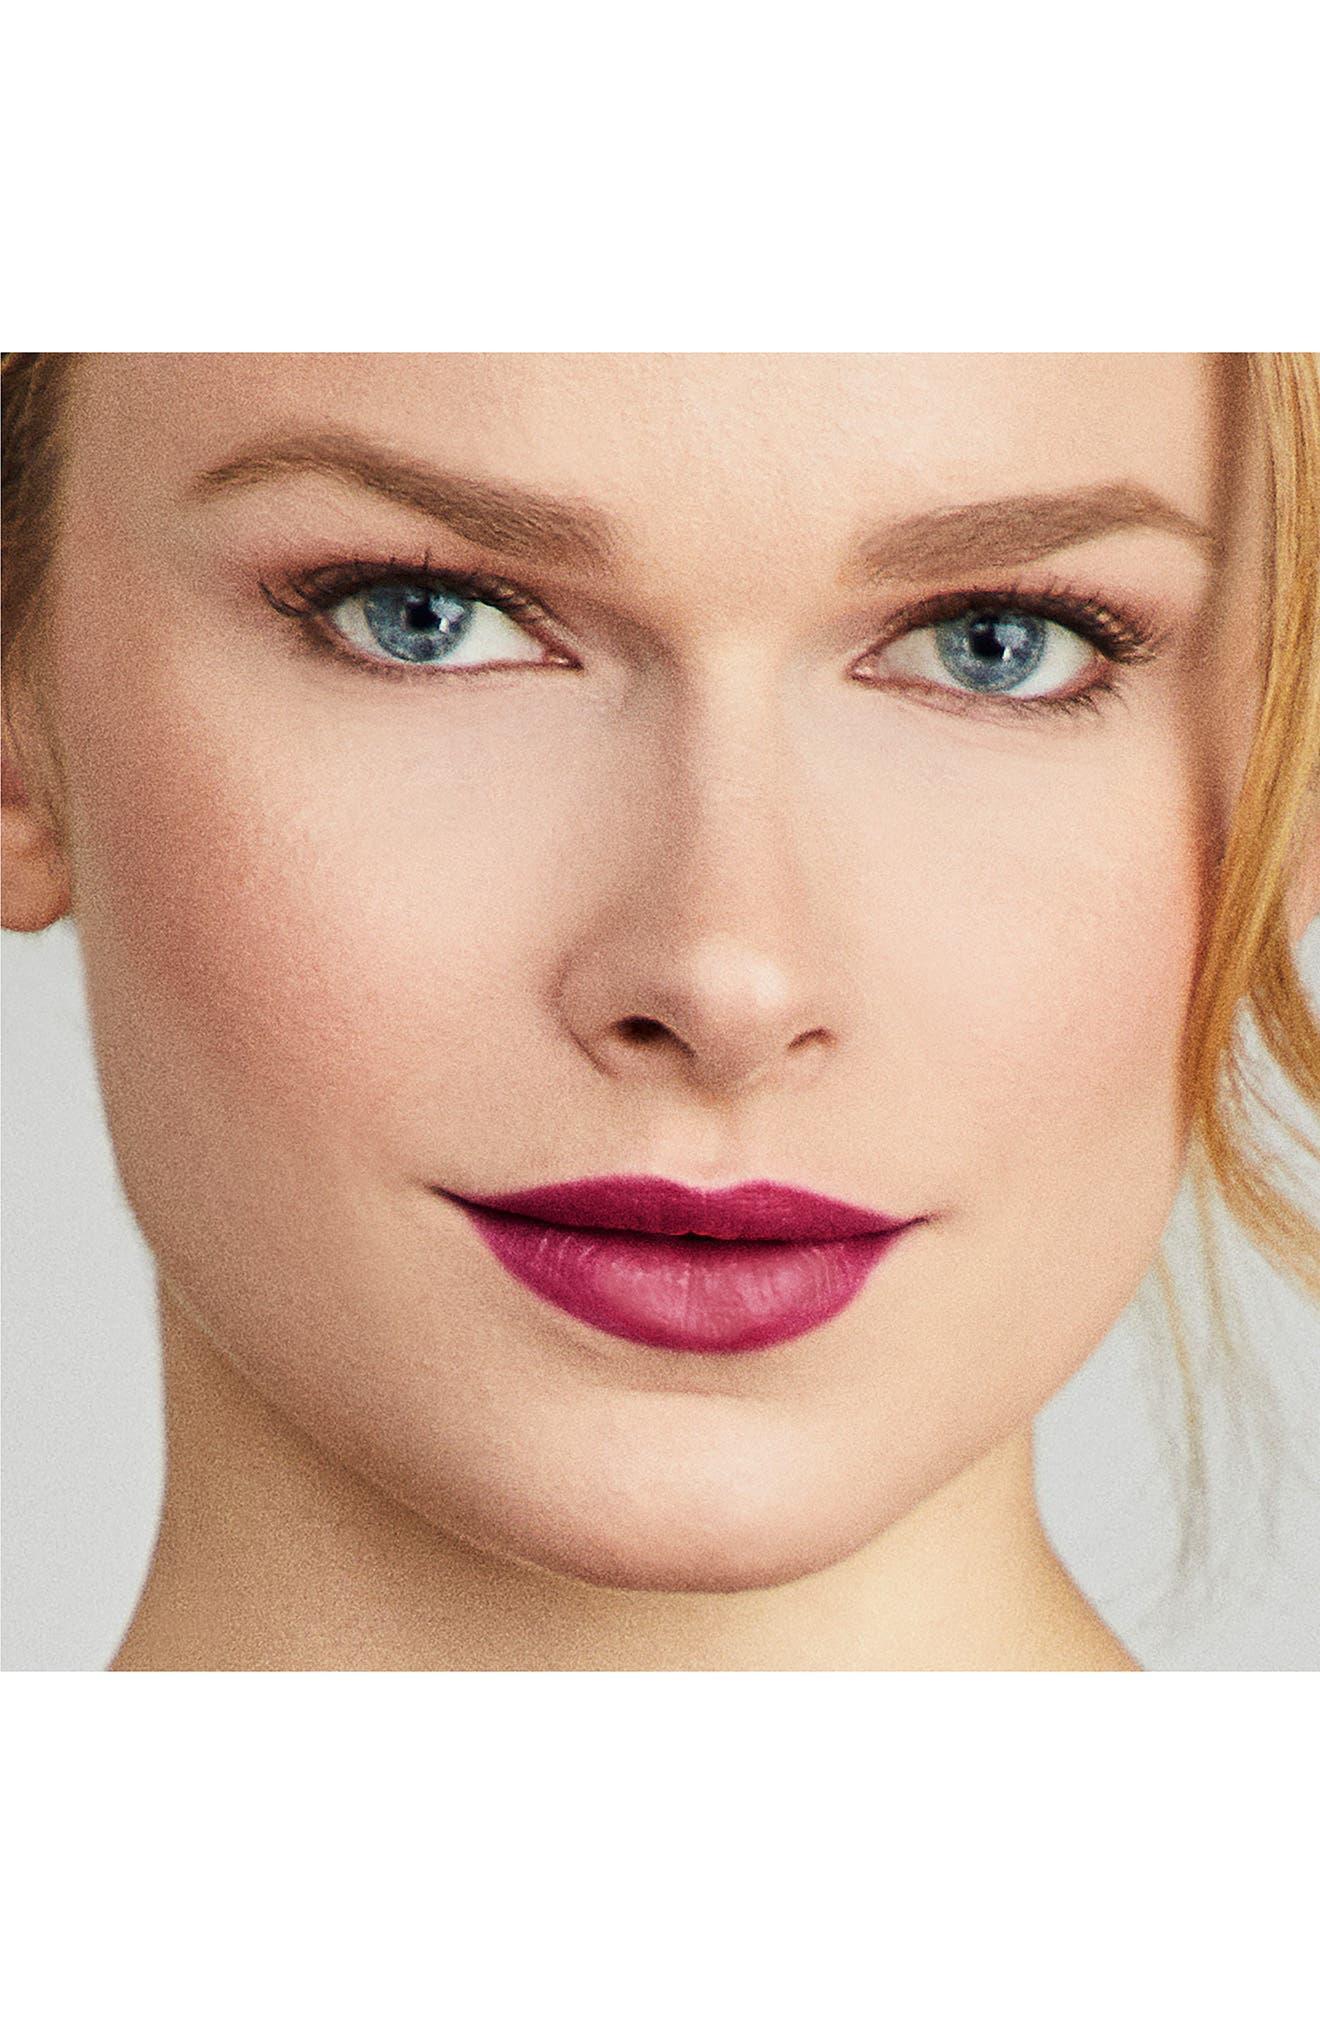 Lipstick Lip Gloss Color Nordstrom Lock It Cushion Pen 10 Nudi Beige